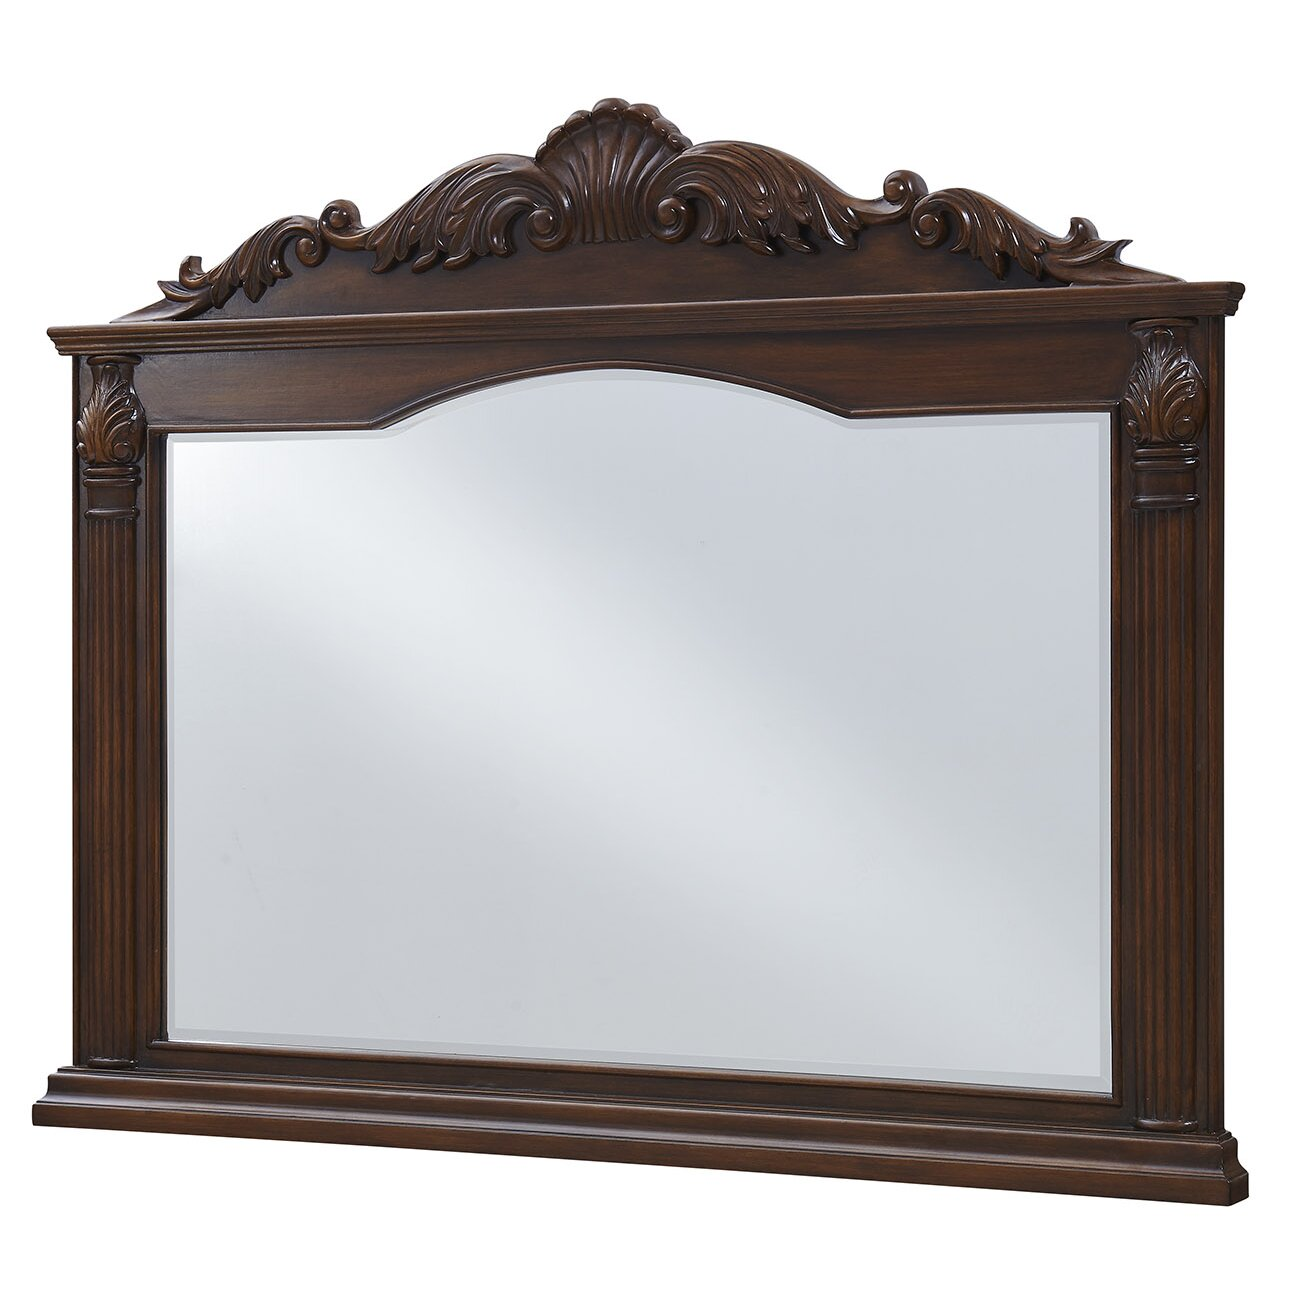 Elegant lighting windsor wall mirror wayfair for Elegant mirrors